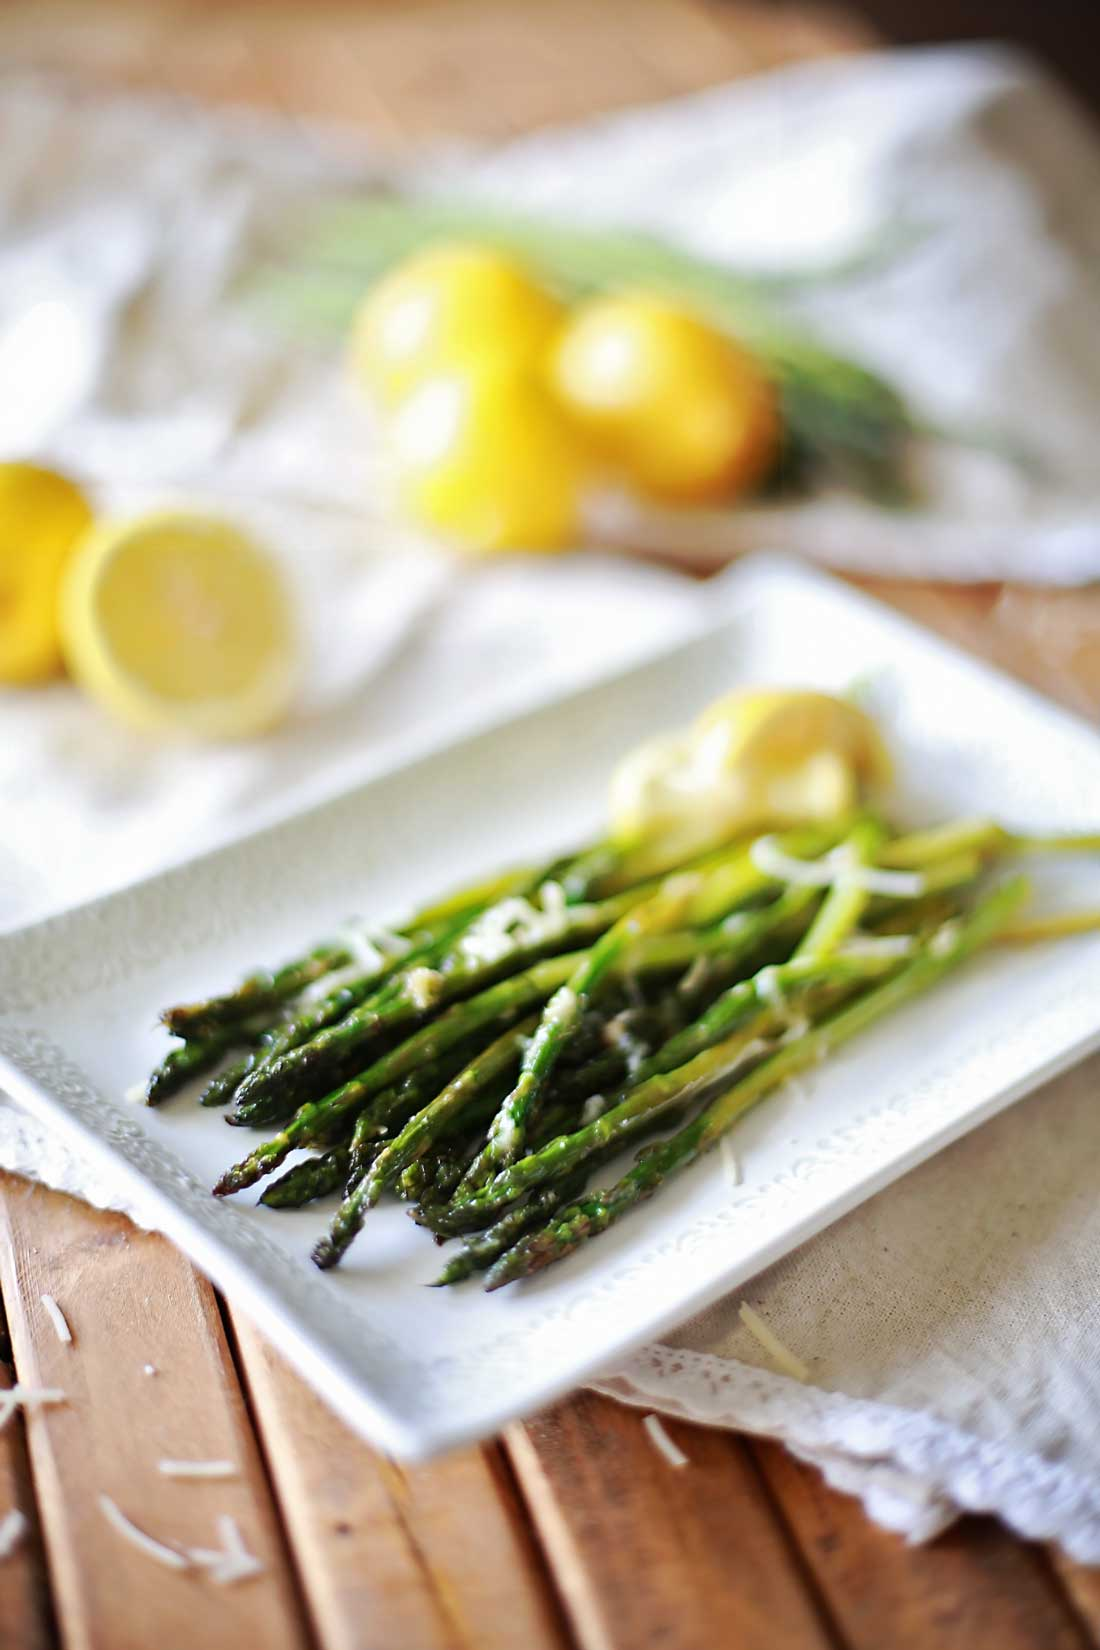 Lemon Parmesan Roasted Asparagus by Flirting with Flavor